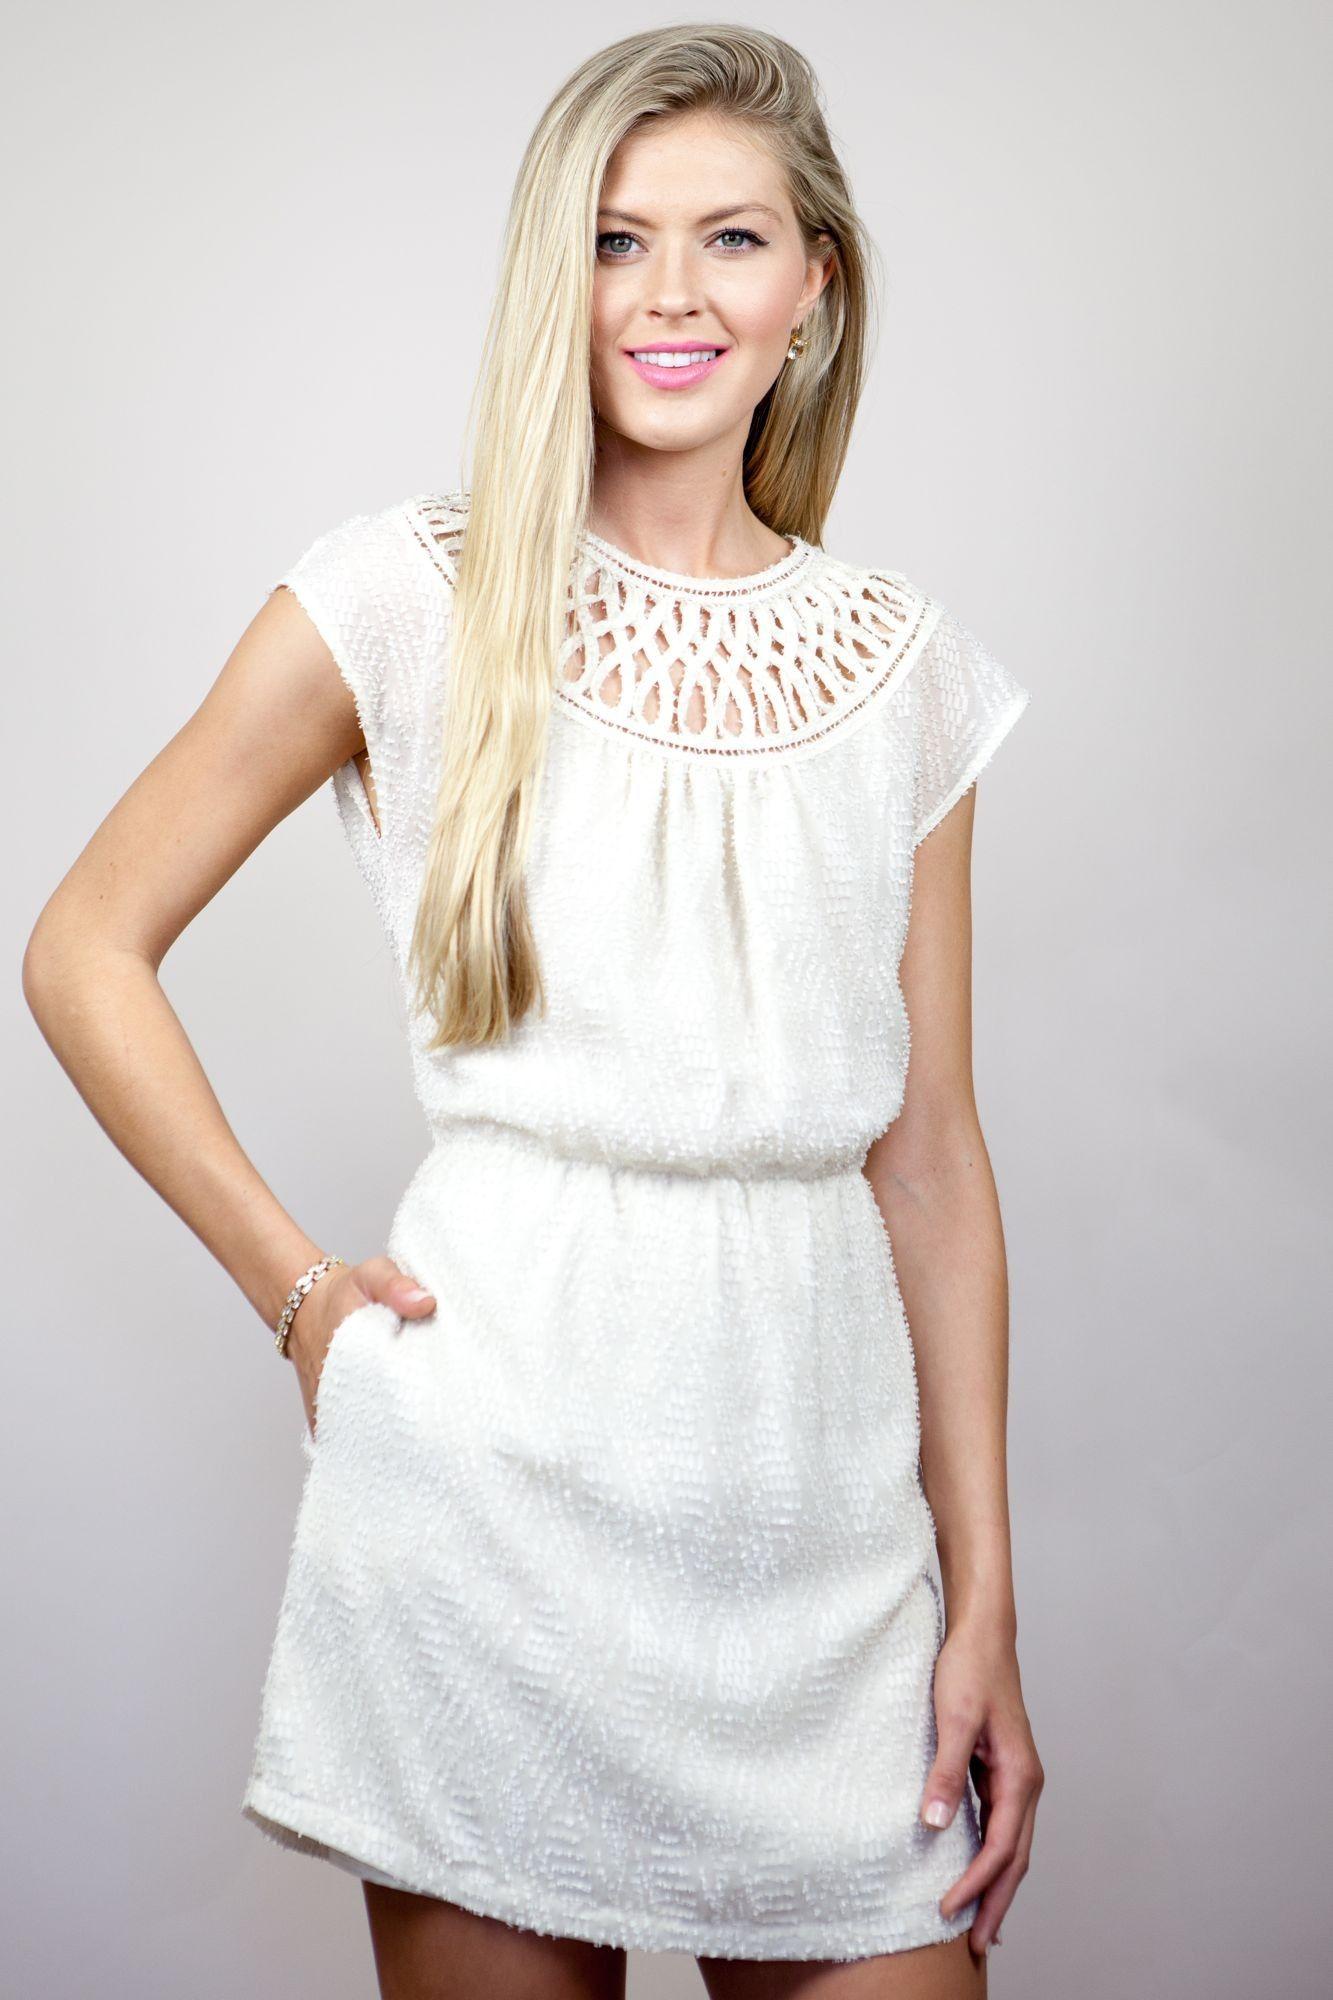 Greylin socialite crochet dress chloe rose who runs the world